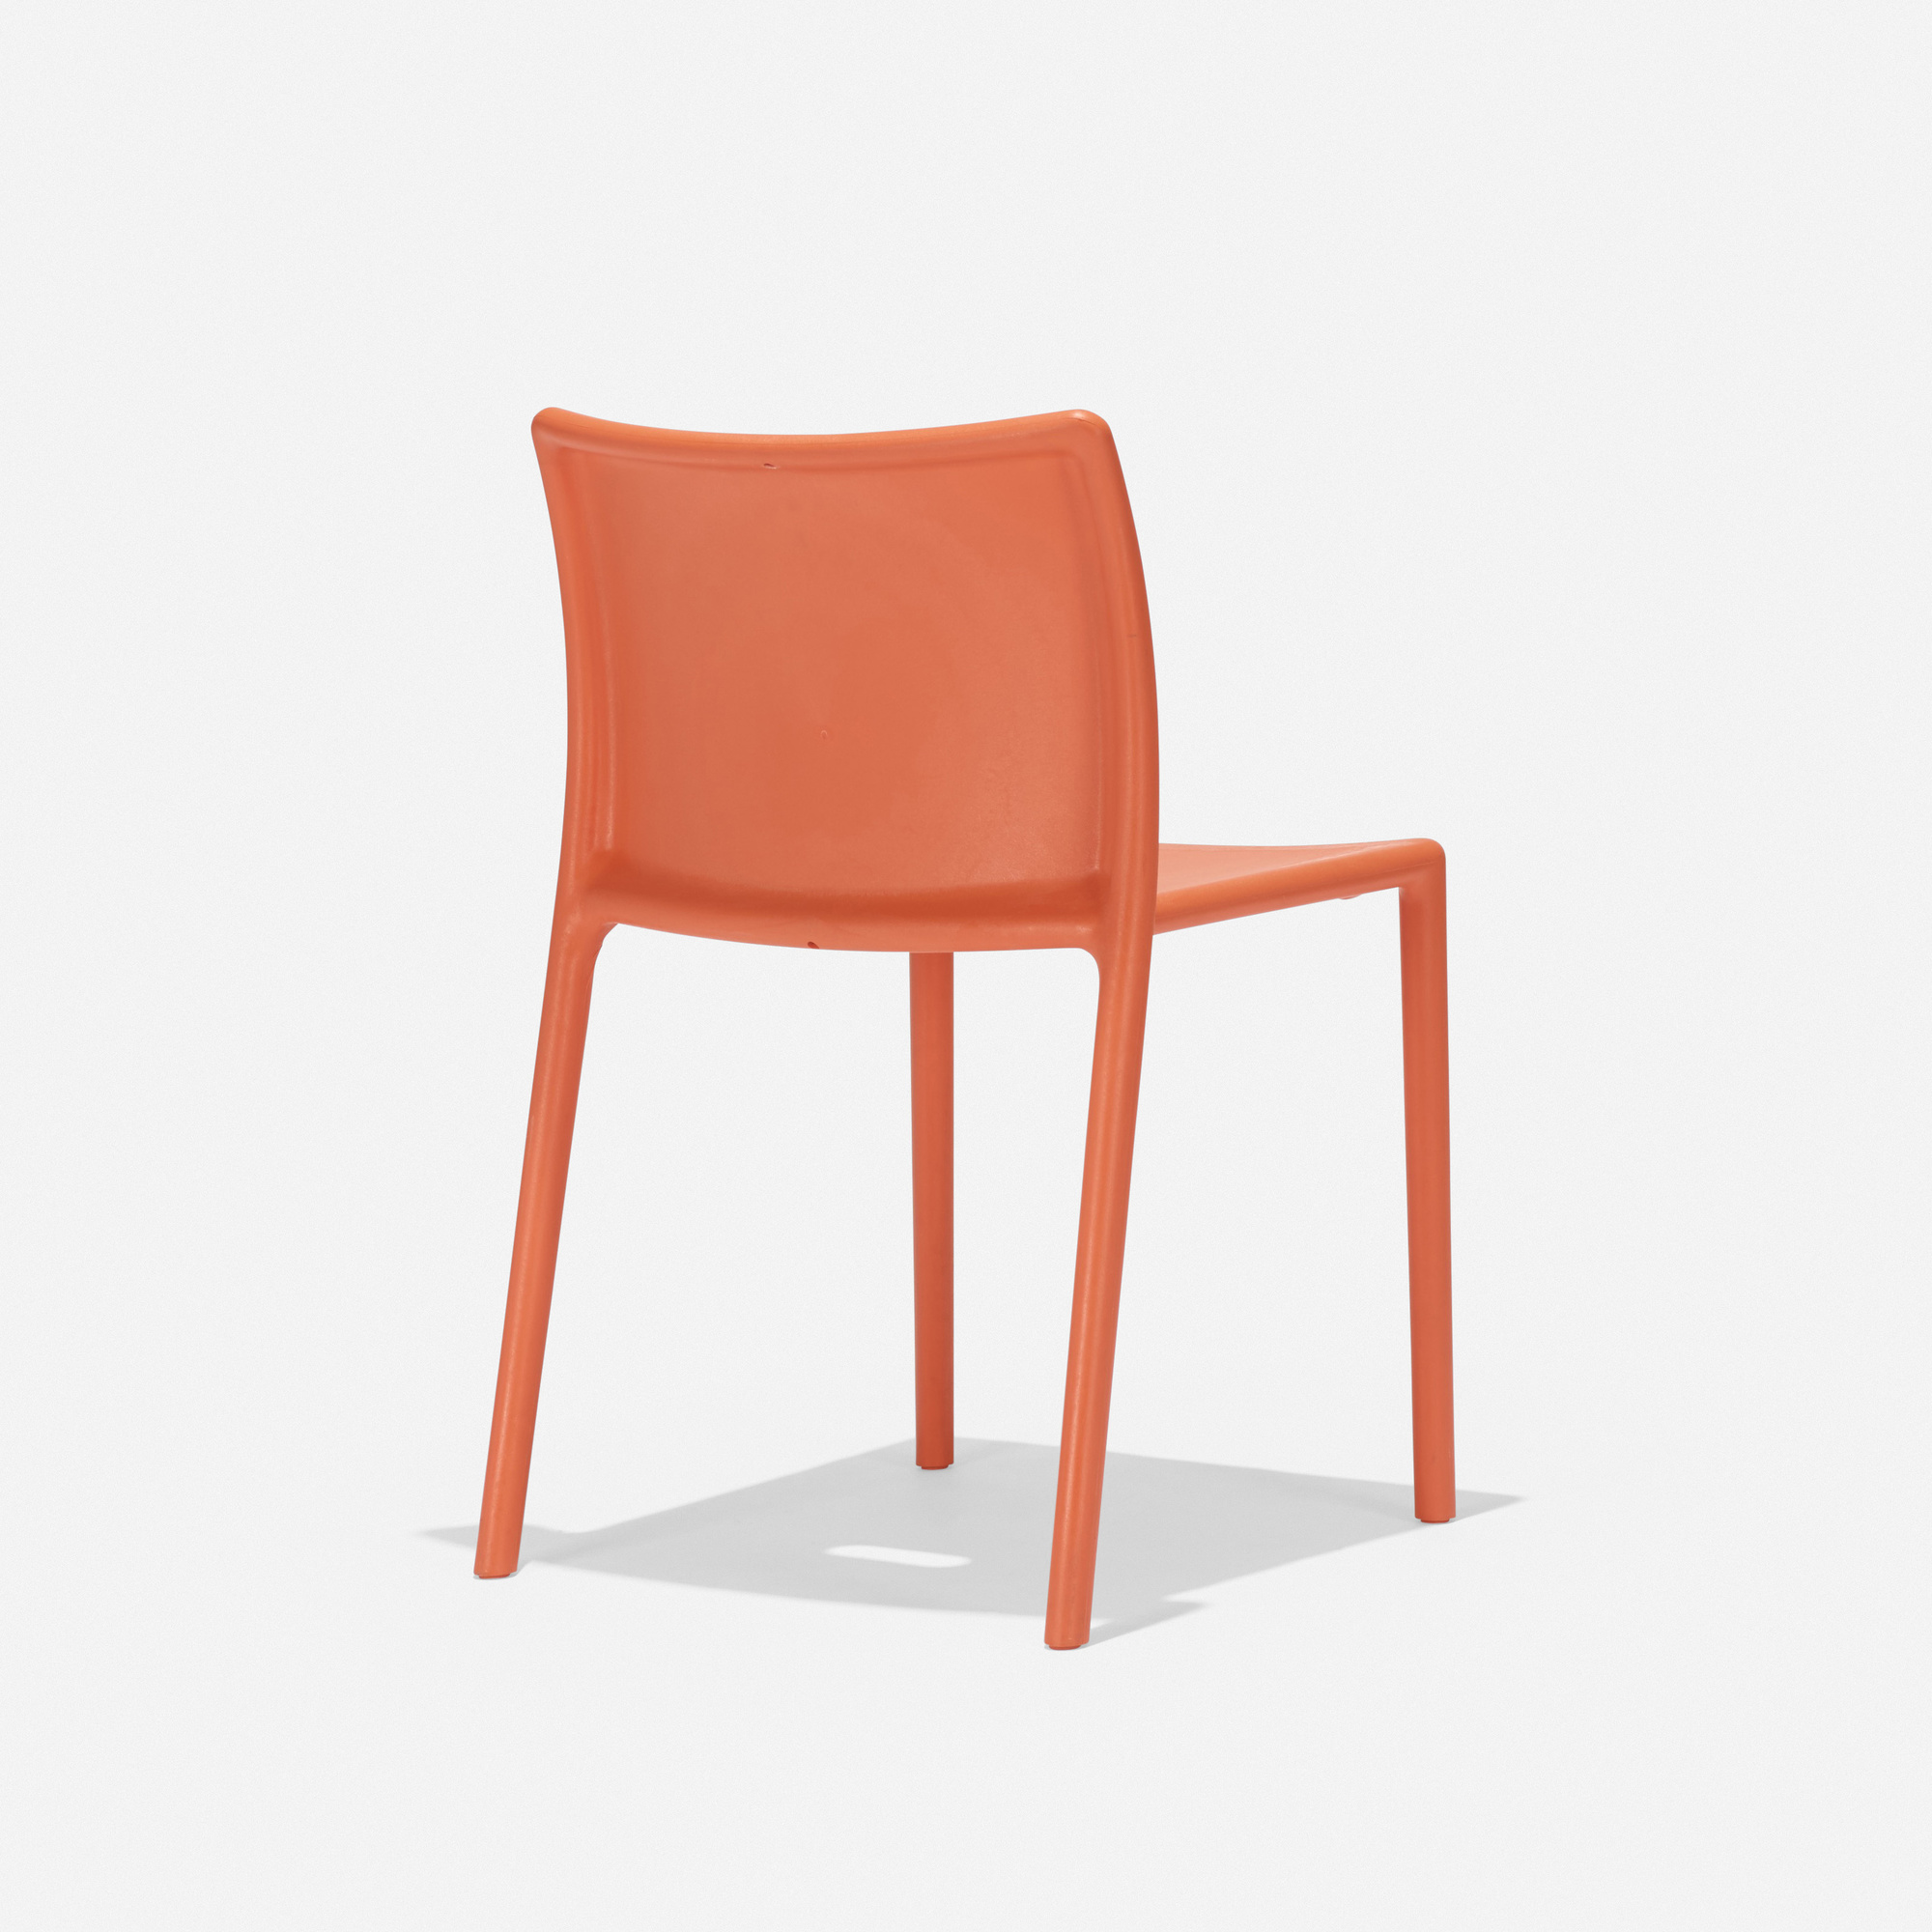 331 jasper morrison air chair. Black Bedroom Furniture Sets. Home Design Ideas